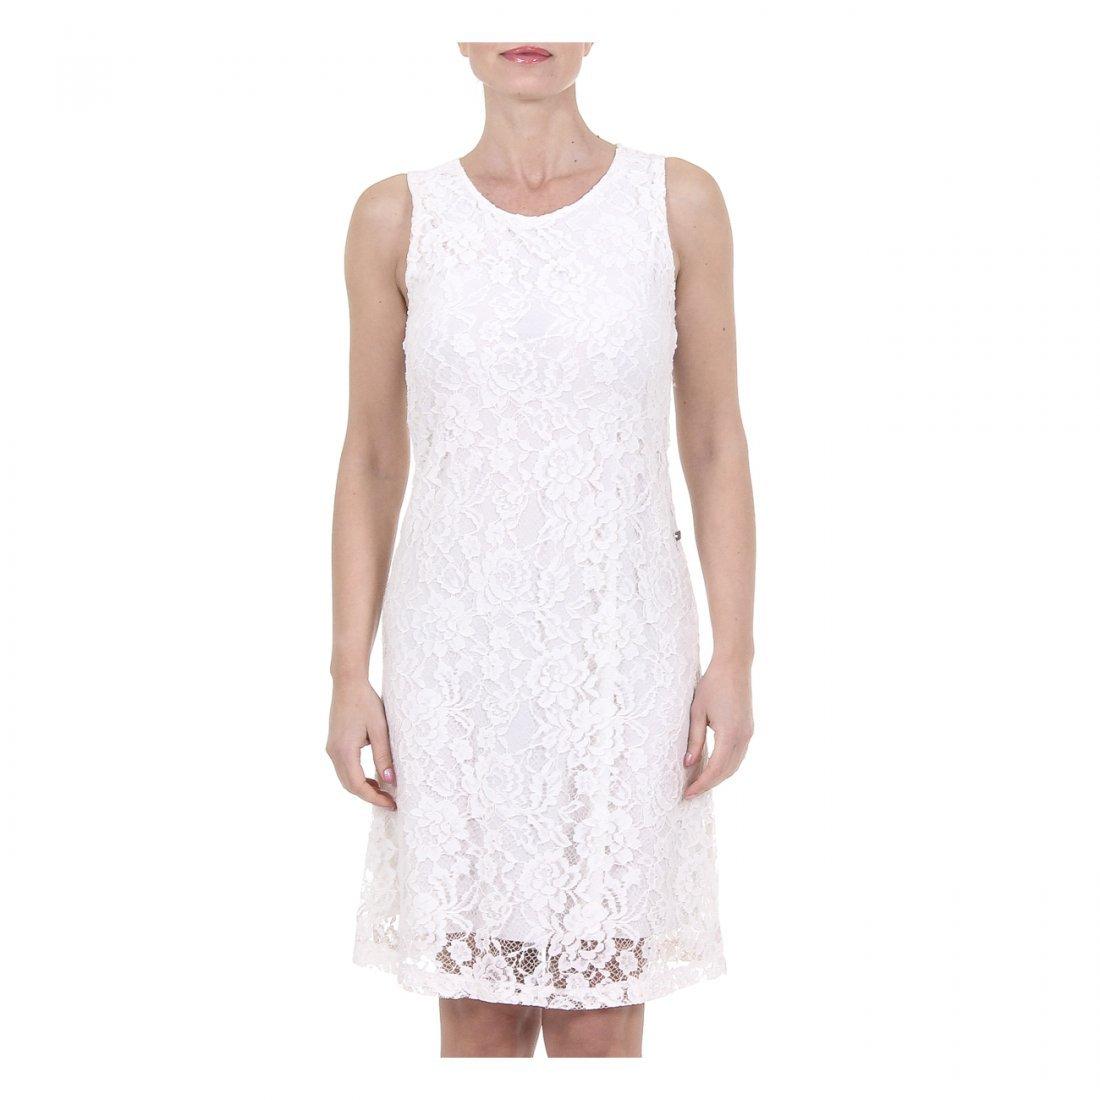 Ladies VERSACE 1969 White Summer Dress